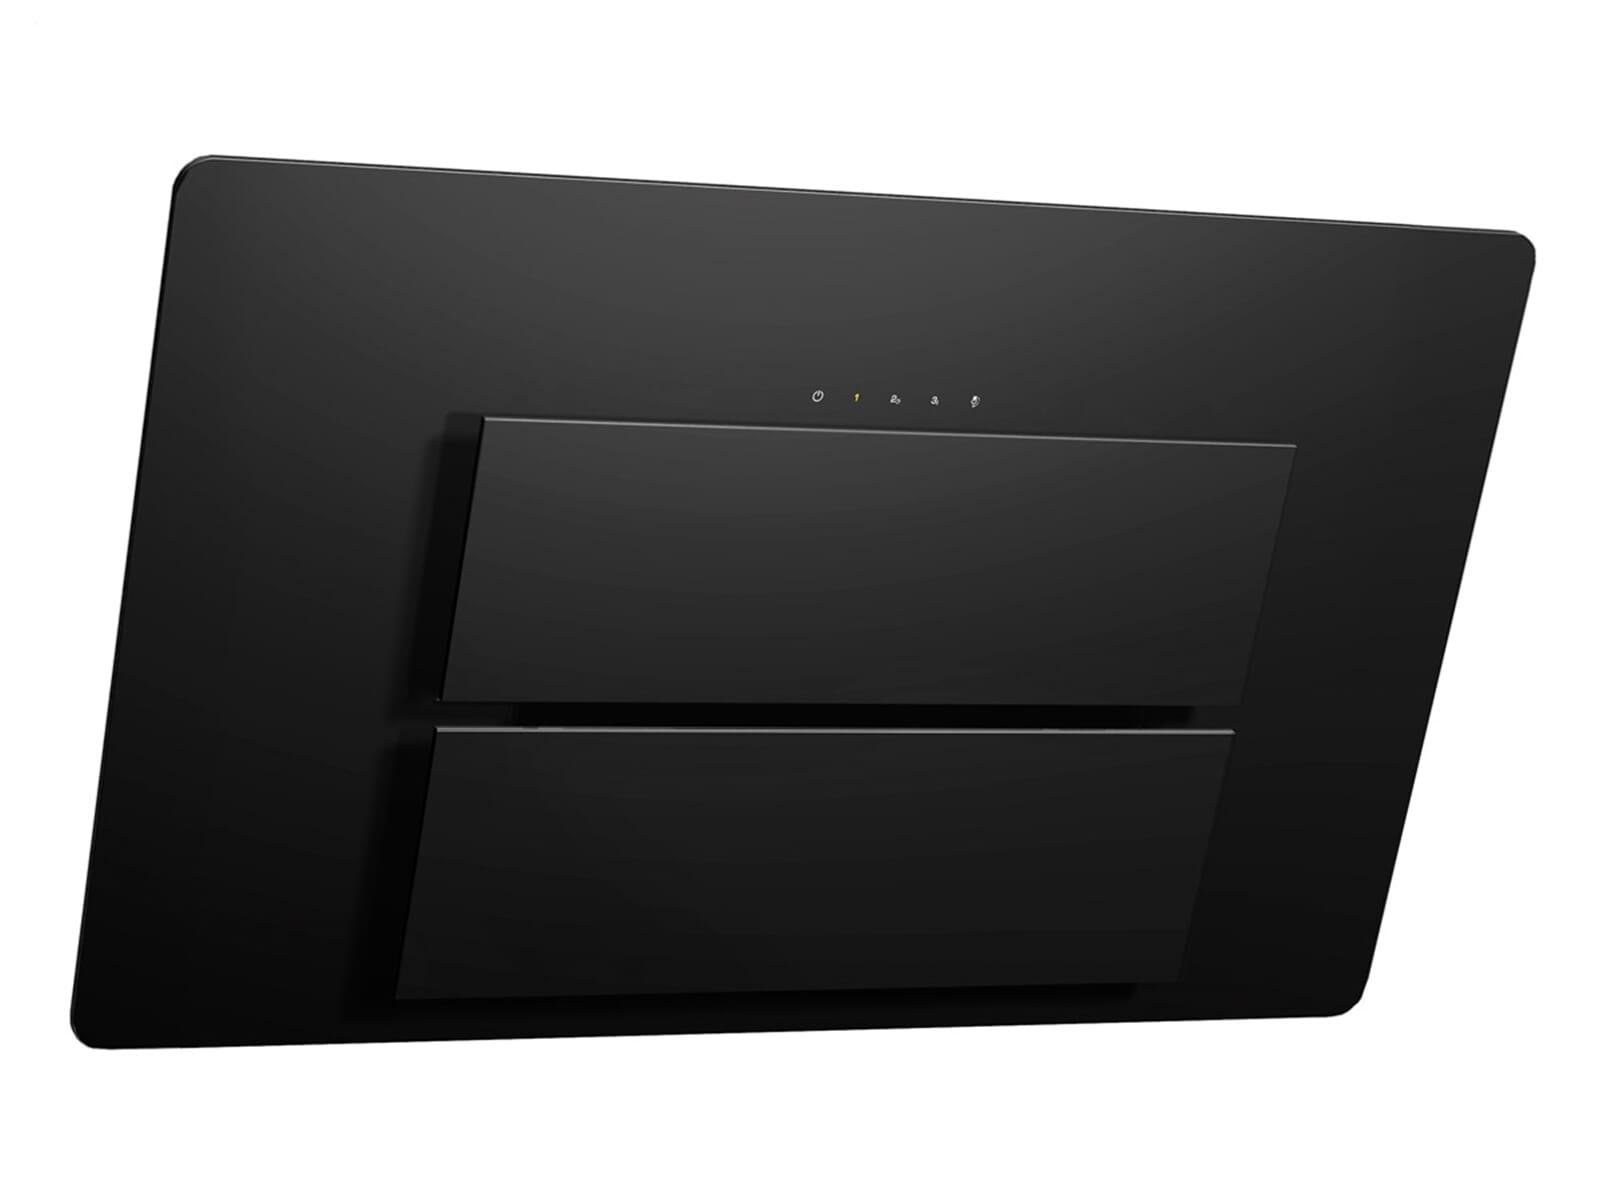 franke maris fma 805 bk kopffrei abzugshaube schwarz glas randabsaugung wandesse ebay. Black Bedroom Furniture Sets. Home Design Ideas